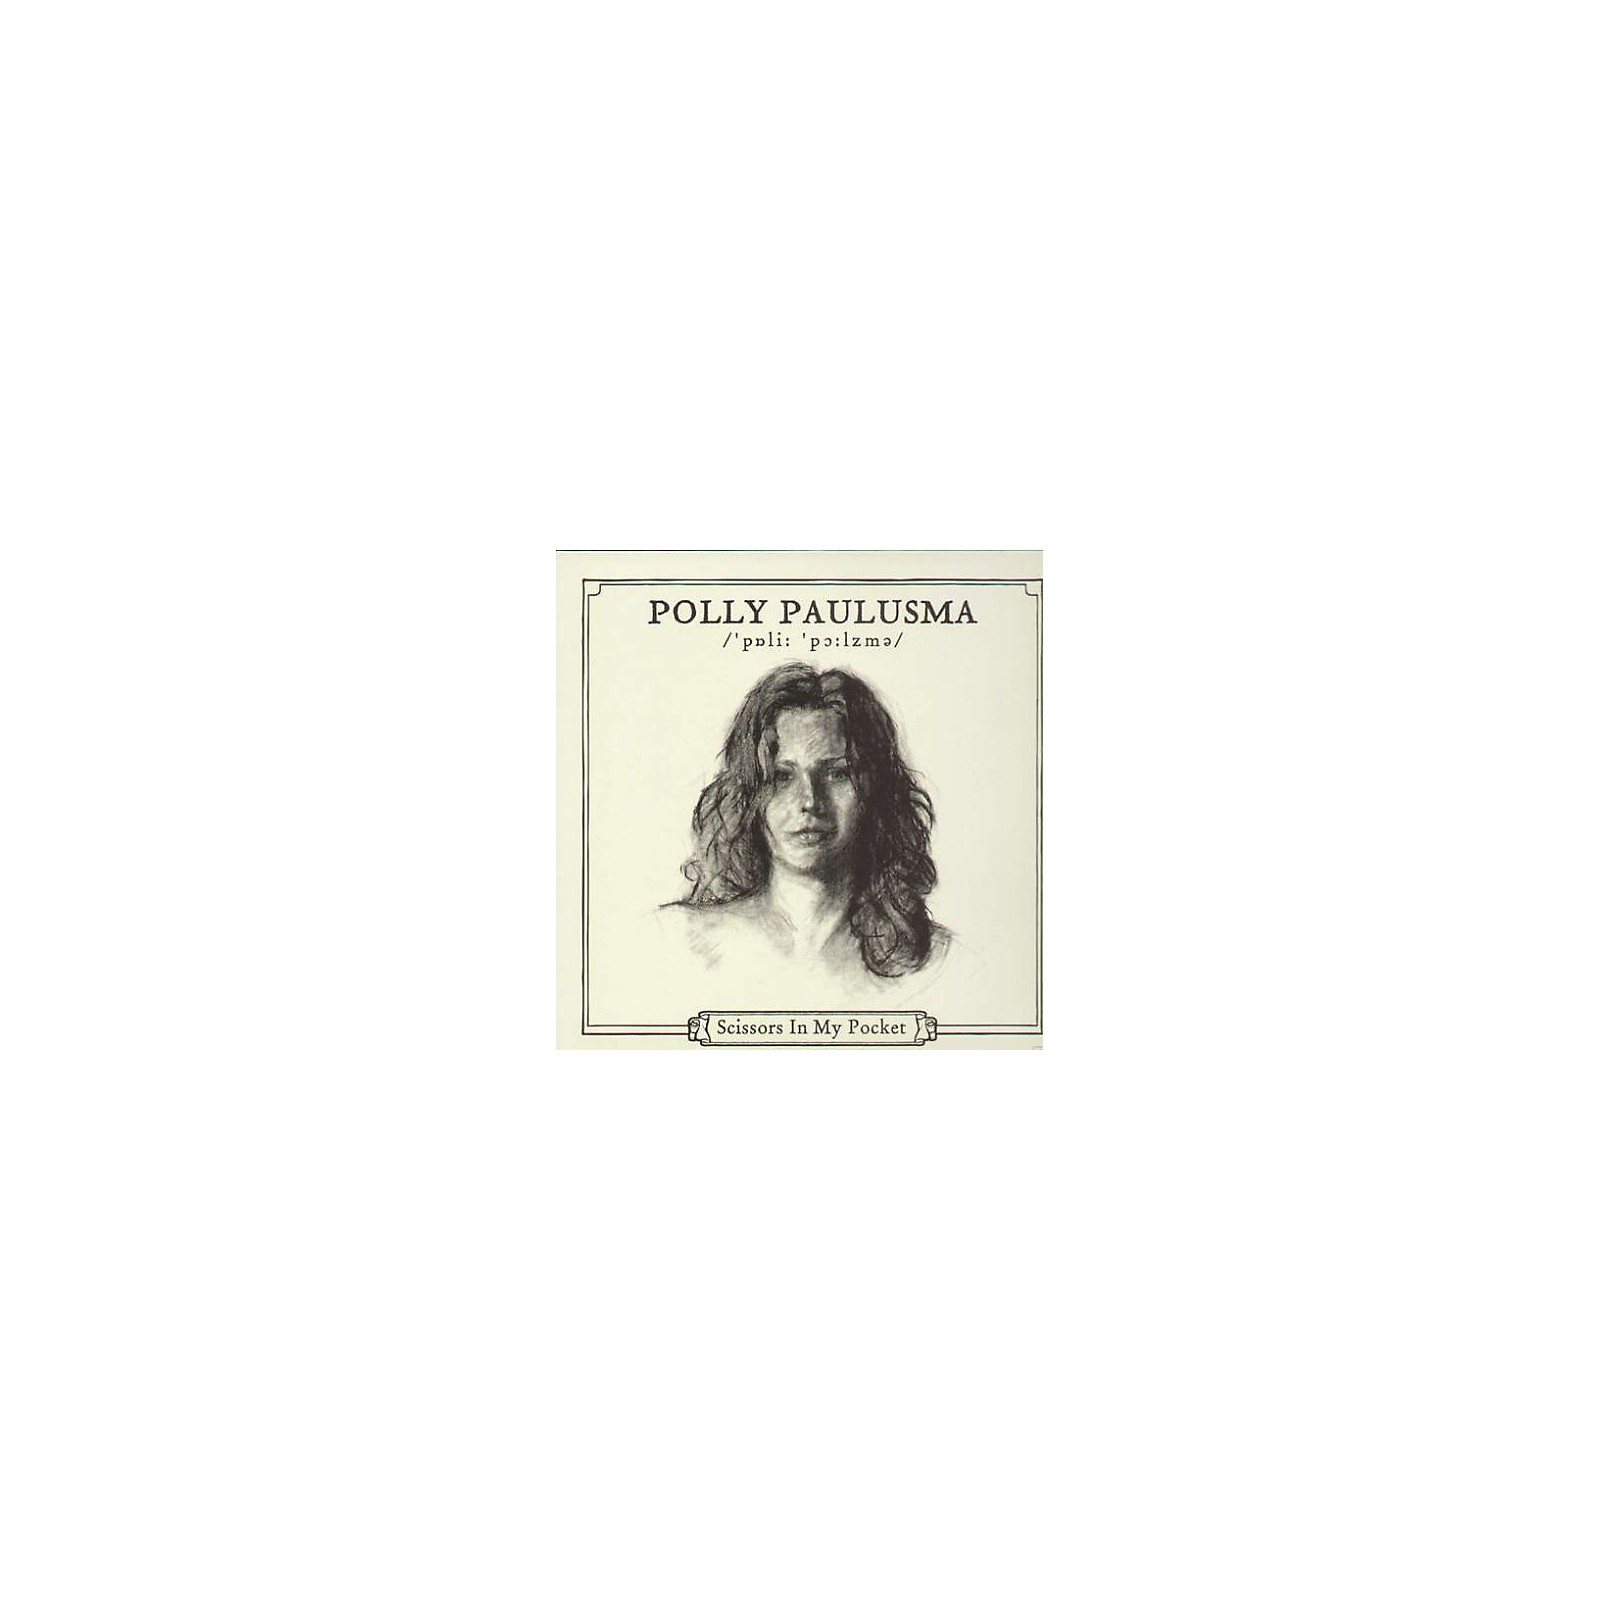 Alliance Polly Paulusma - Scissors in My Pocket